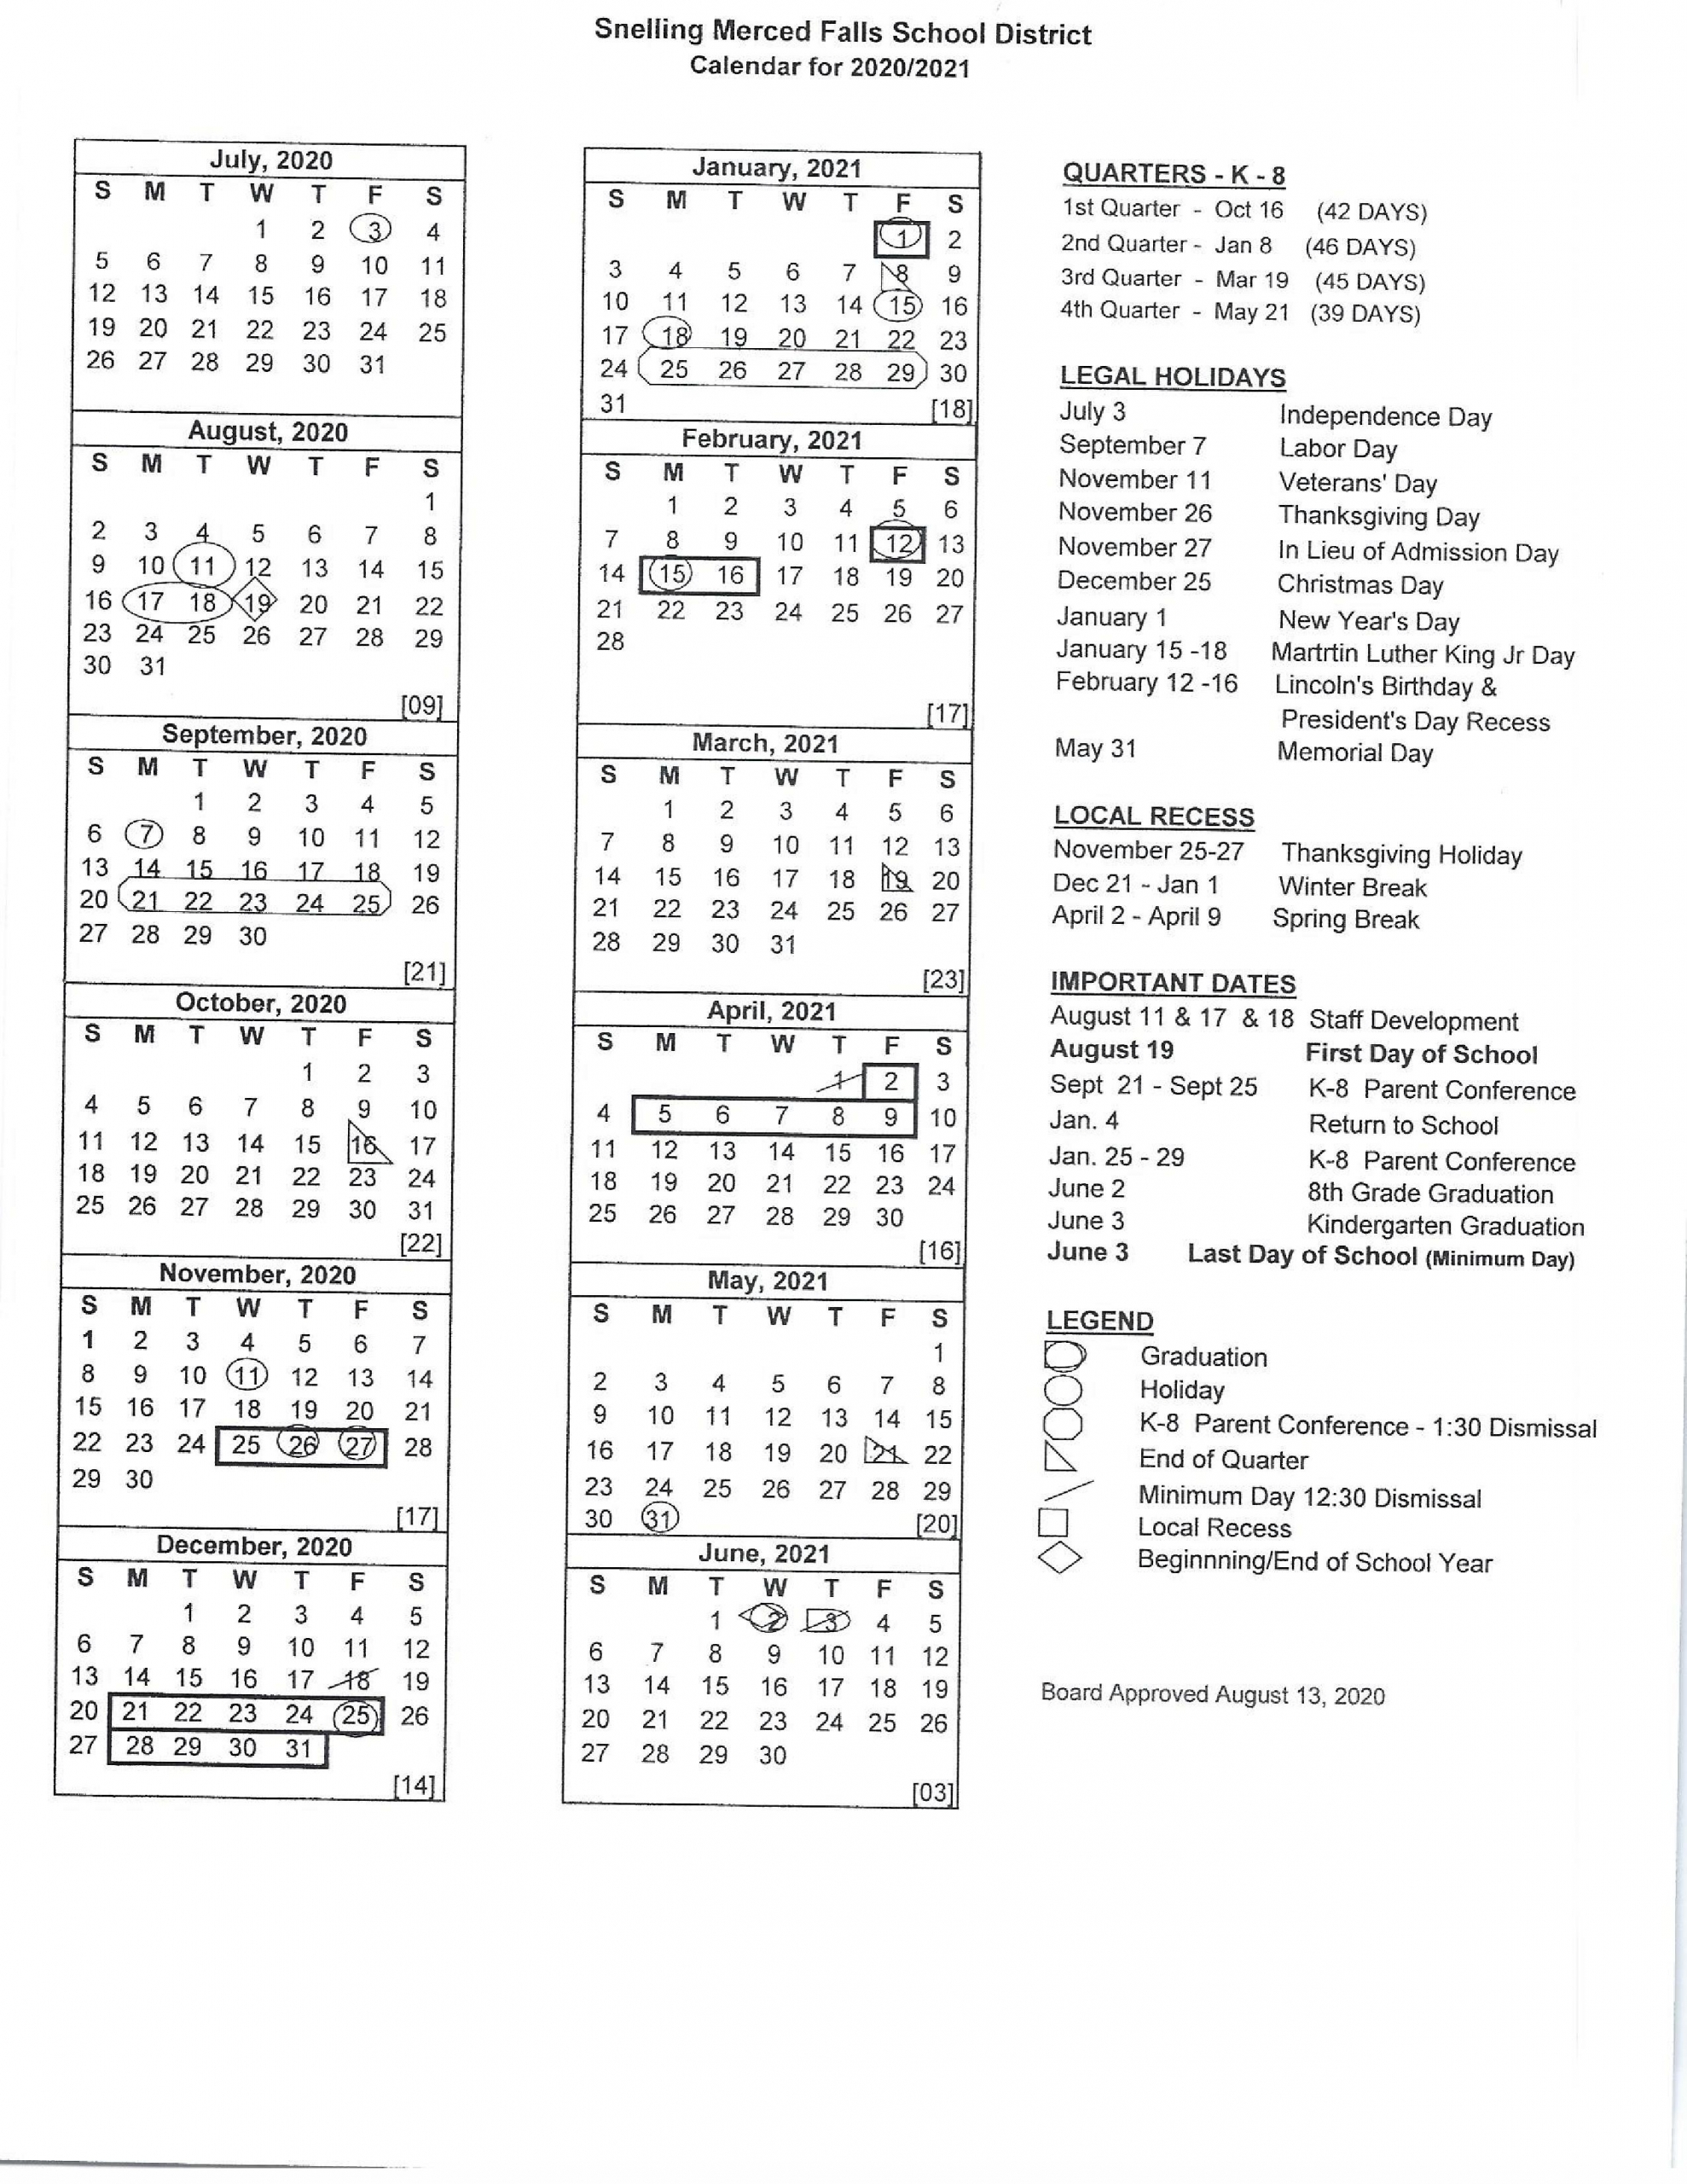 Calendar – Snelling Merced Falls Elementary With City Of Merced School District Calendar